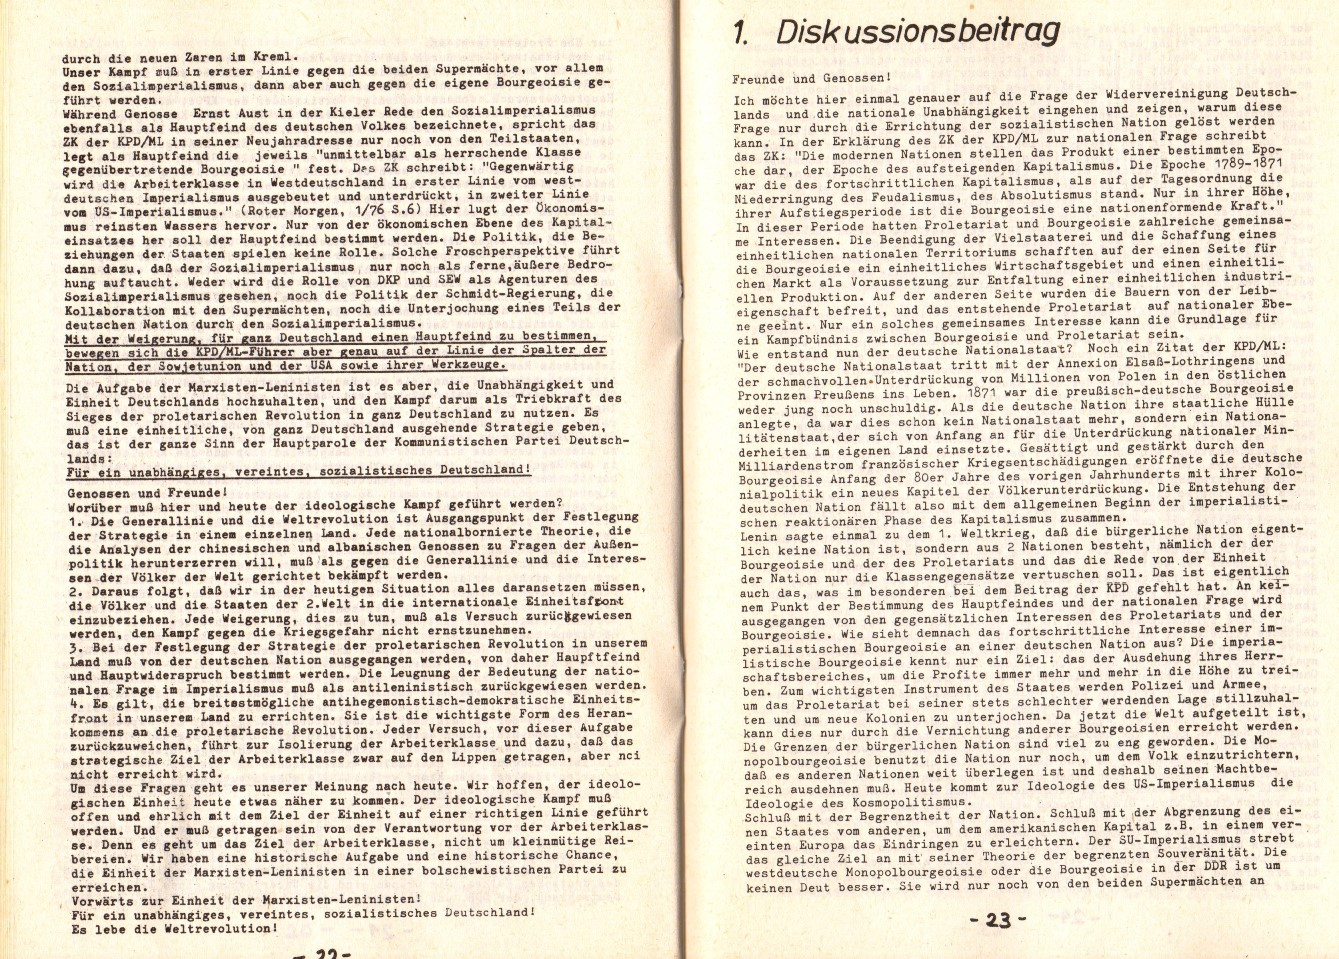 Berlin_AO_1976_Veranstaltung_mit_KPDML_12